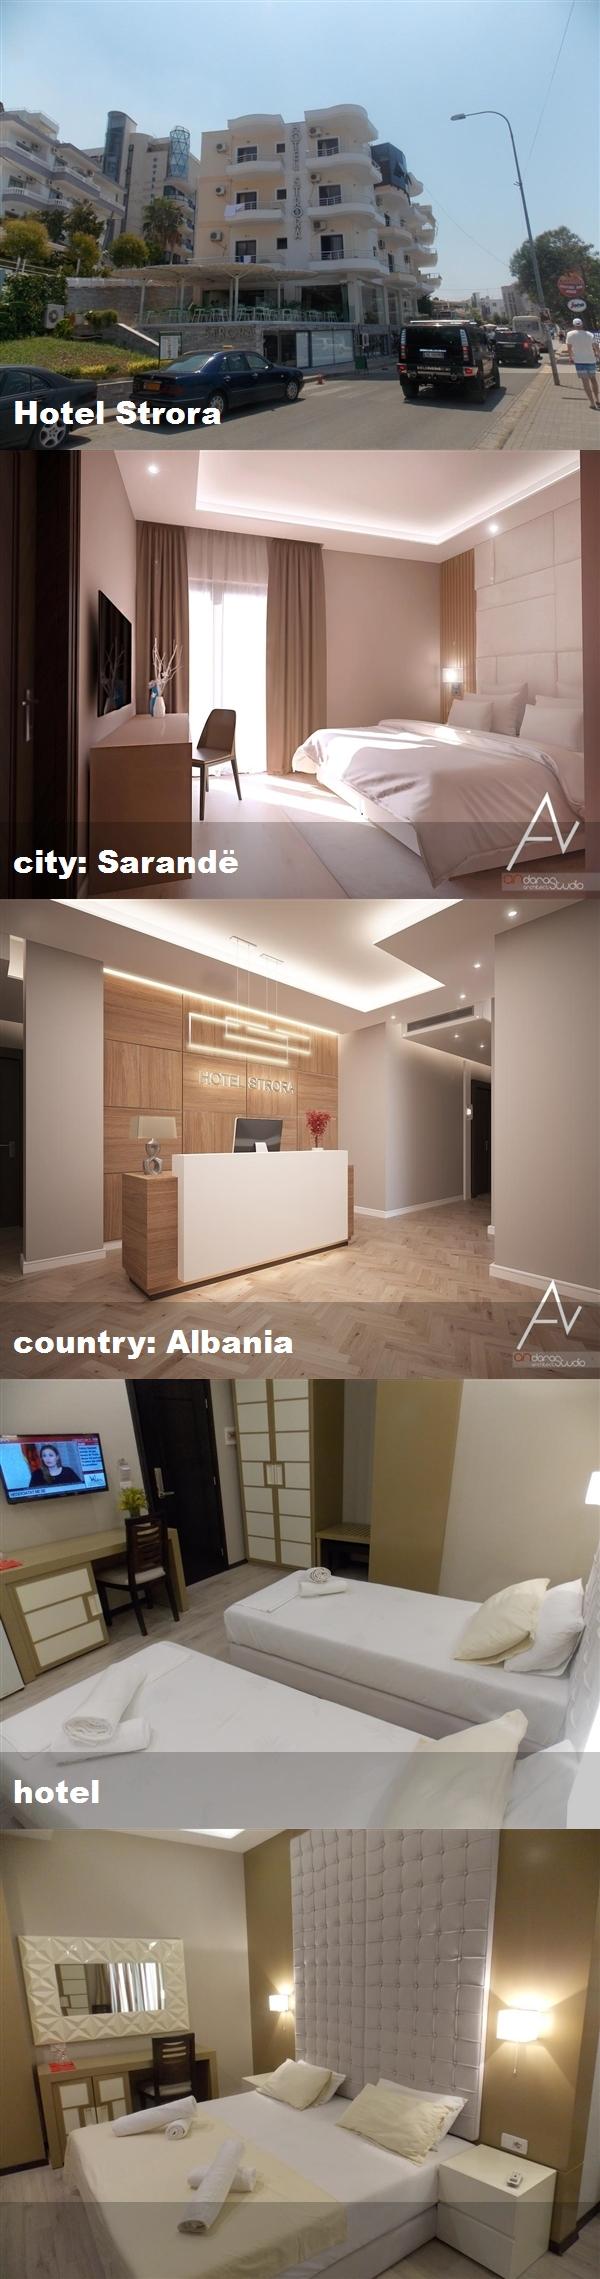 Hotel Strora, city Sarandë, country Albania, hotel